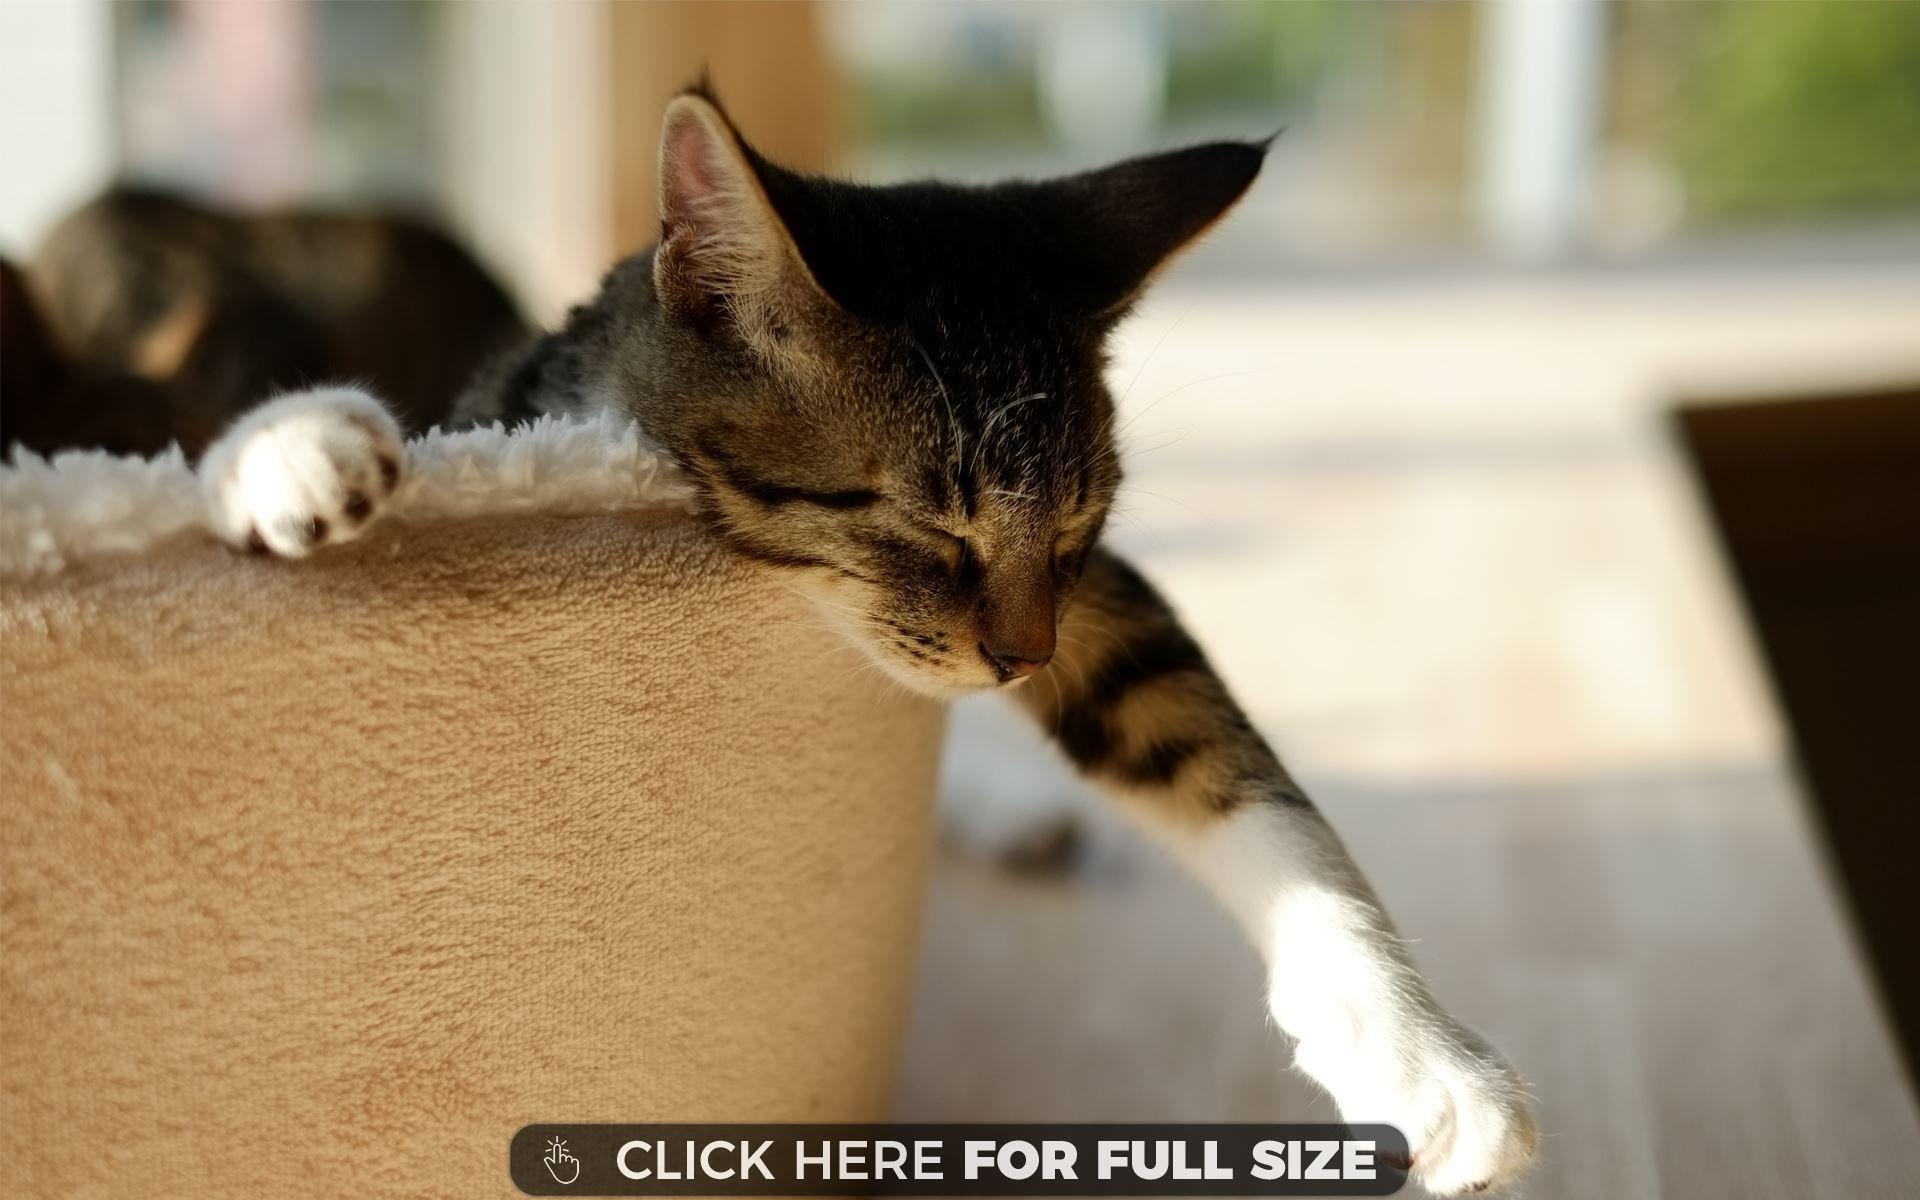 Cute Lazy Cat wallpaper Cat sleeping, Cat wallpaper, Cats